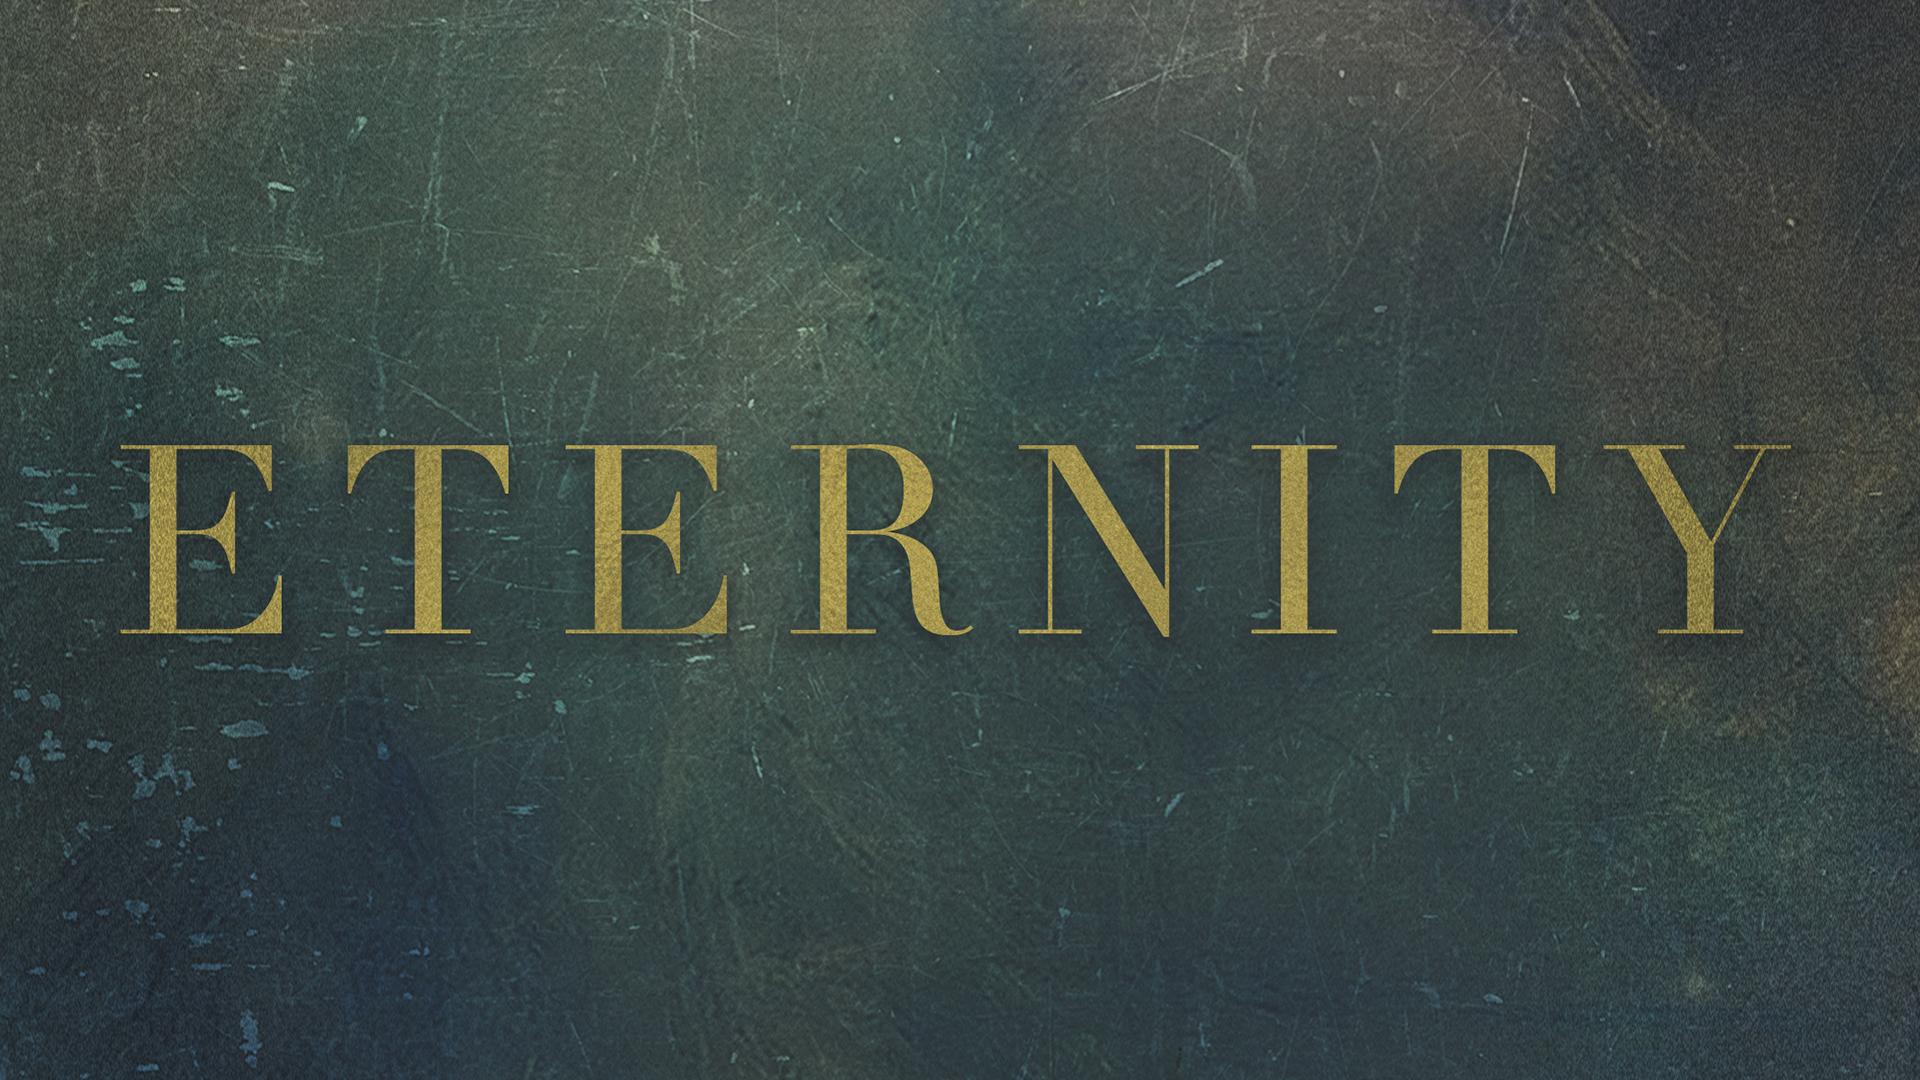 Eternity - A series on Heaven